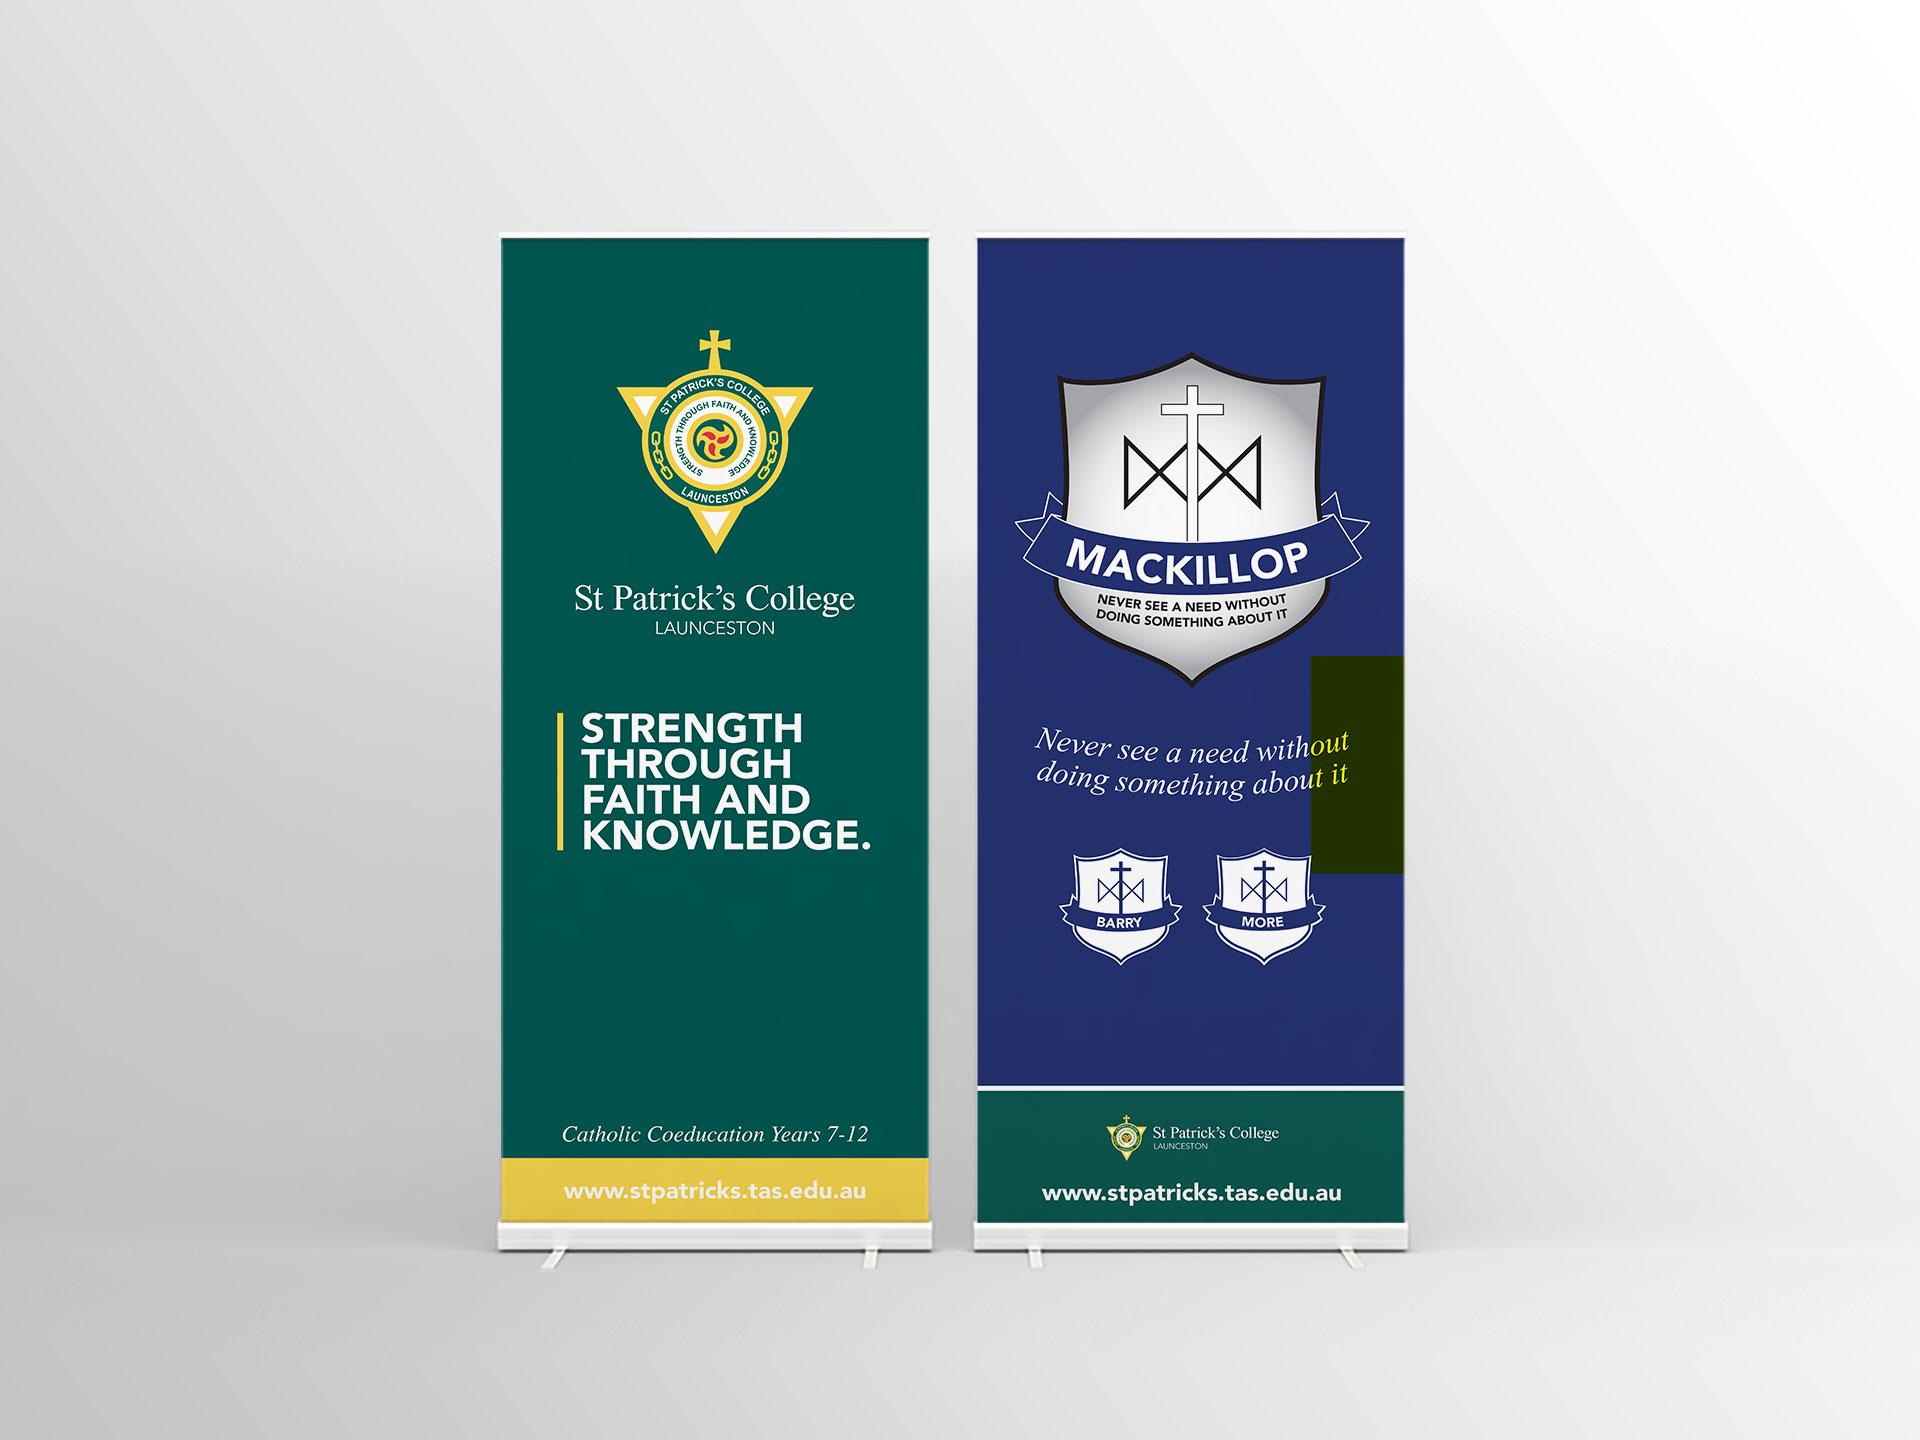 St Patrick's College Launceston